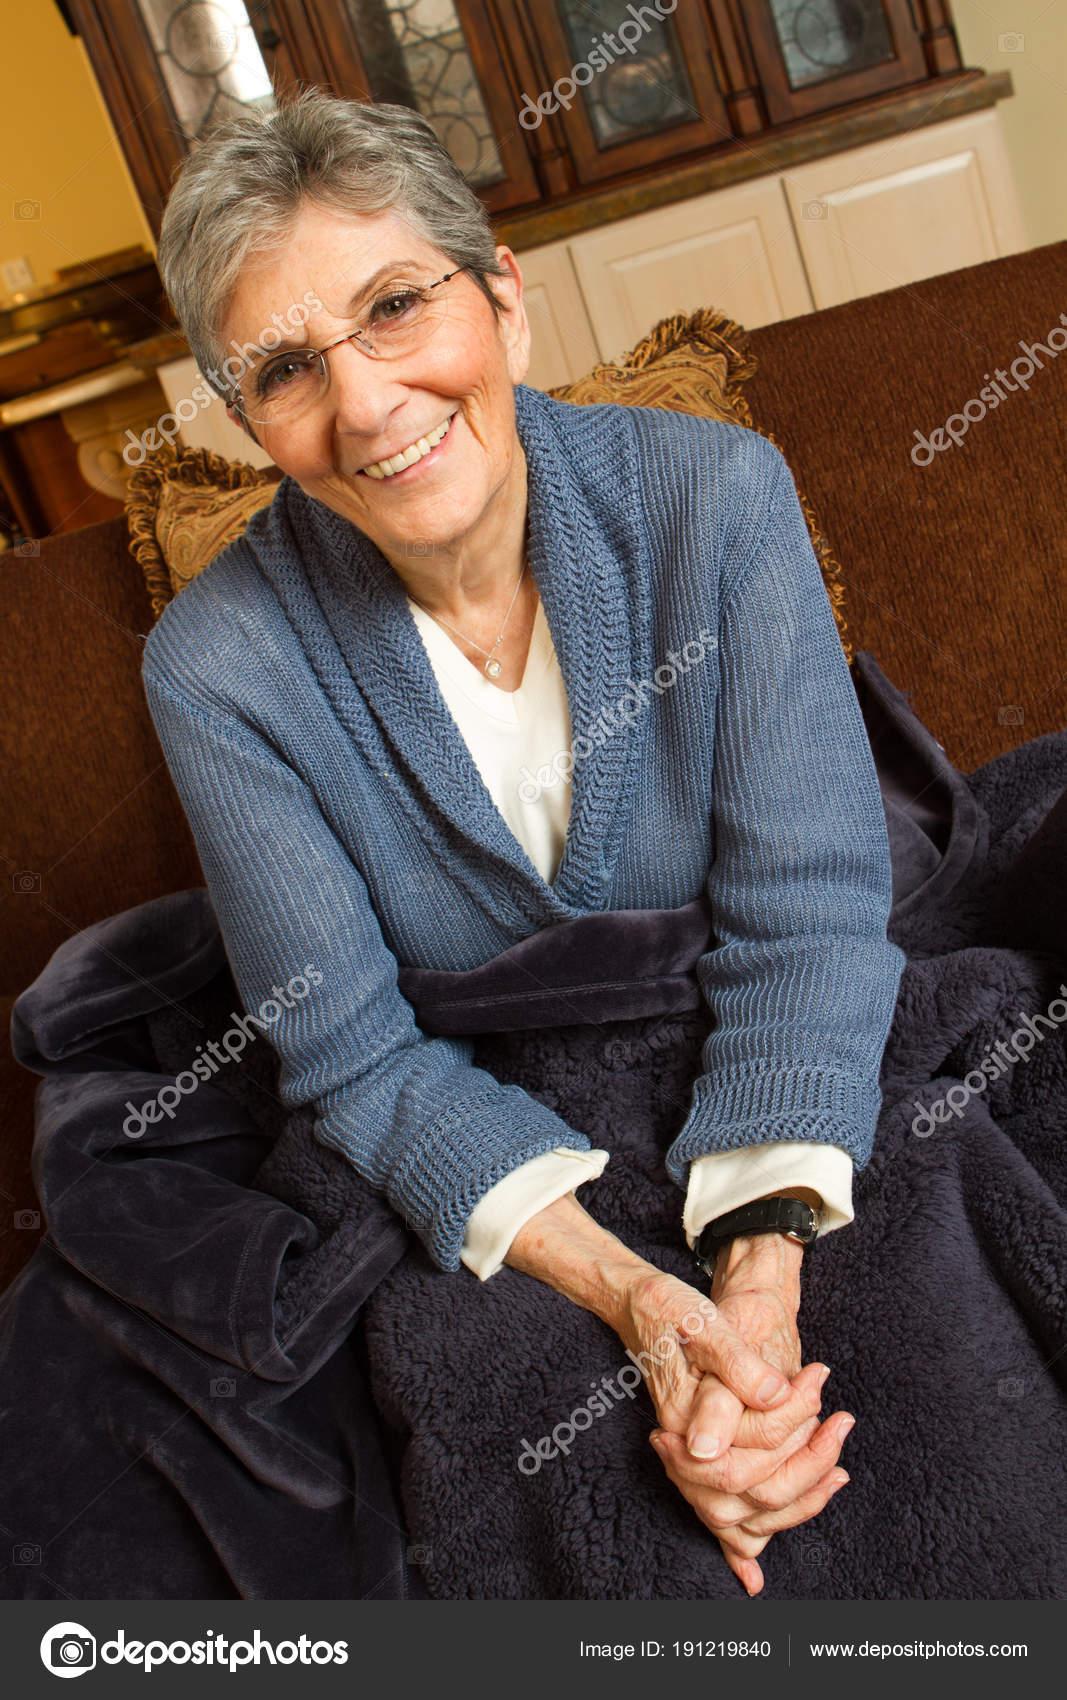 Amature older woman